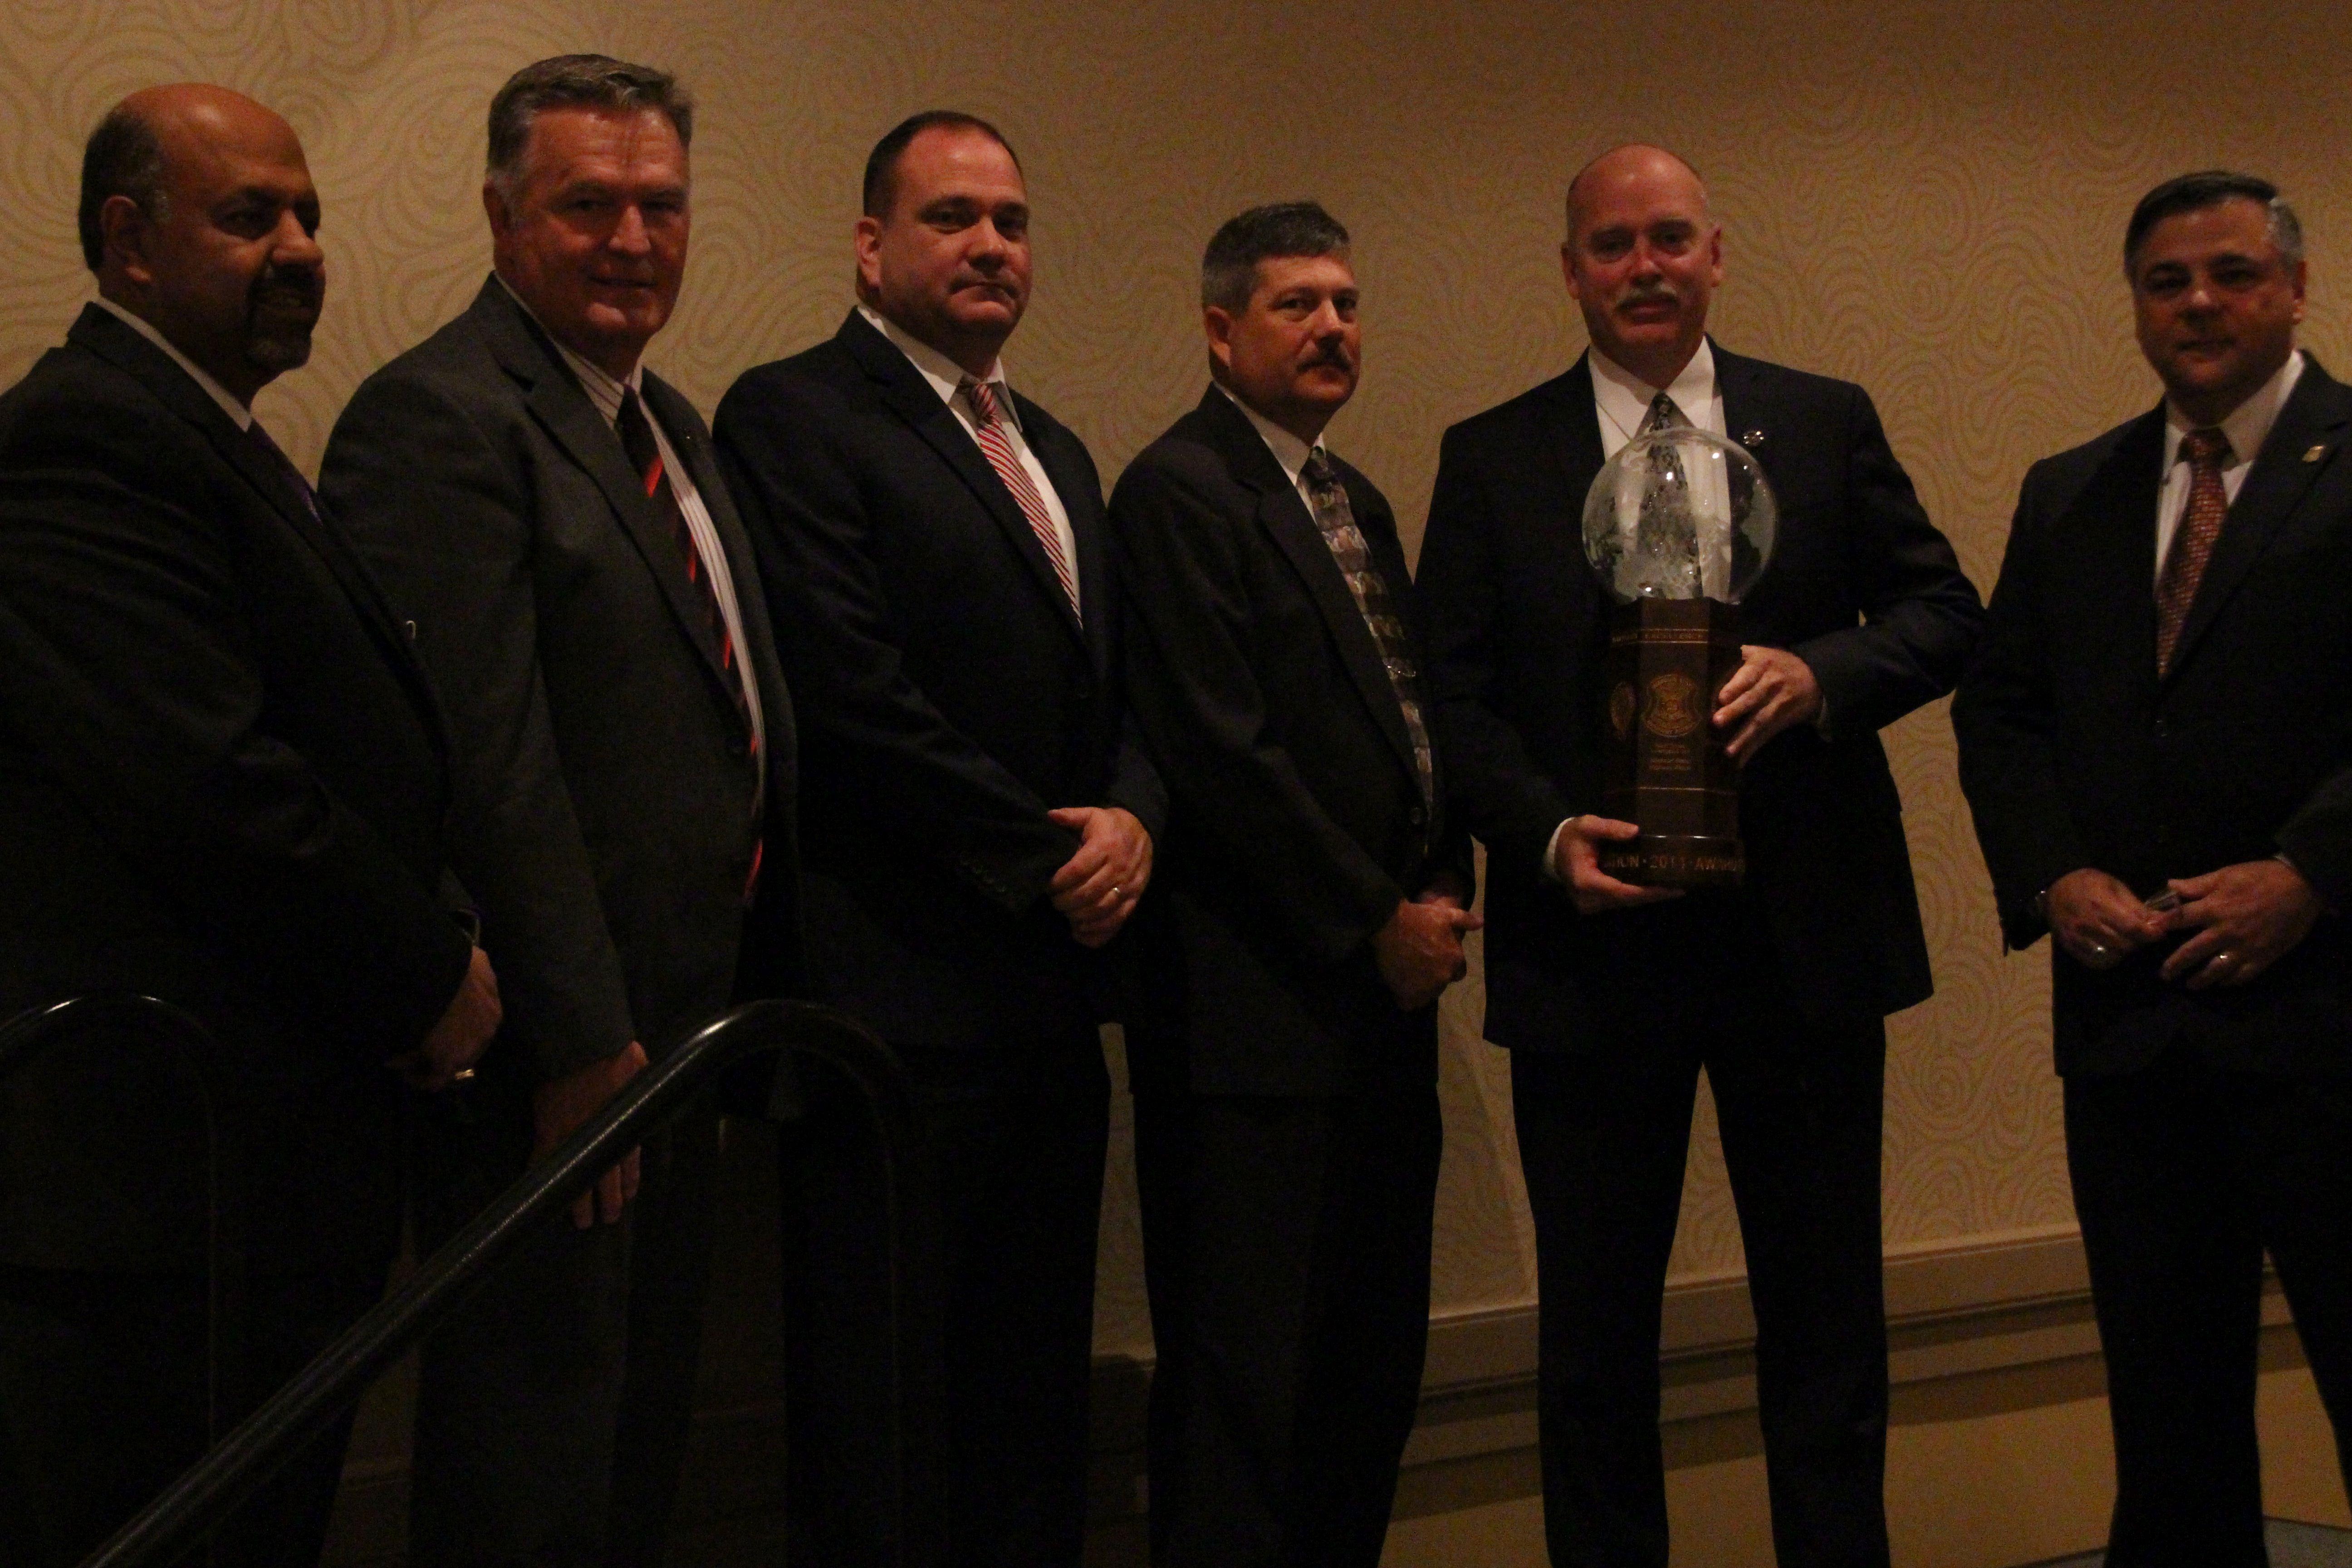 Missouri State Highway Patrol Rural Crimes Investigative Unit Wins Award